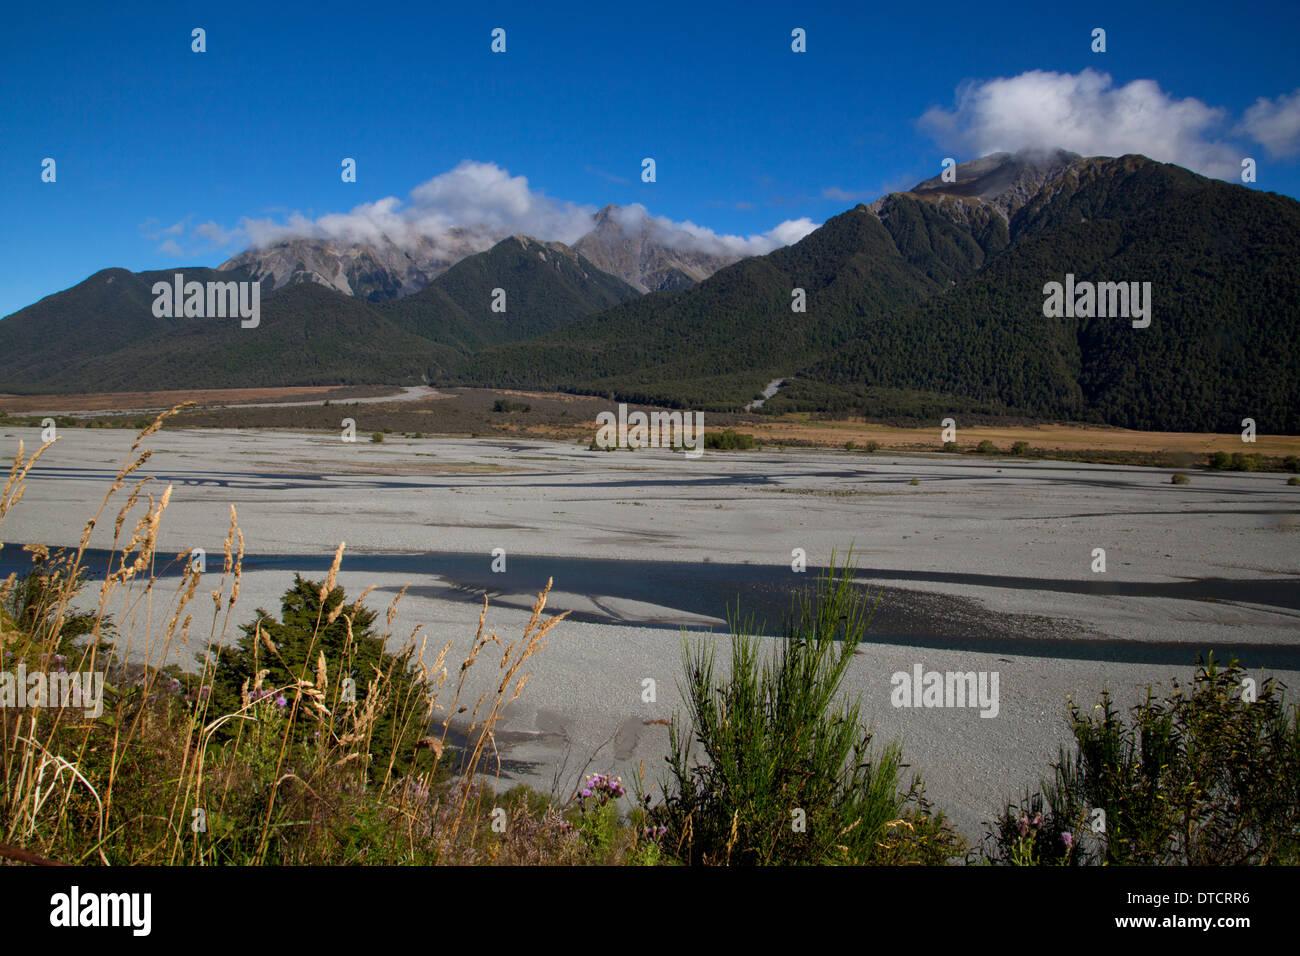 View down valley near Cass, Arthurs Pass National Park, South Island, New Zealand - Stock Image